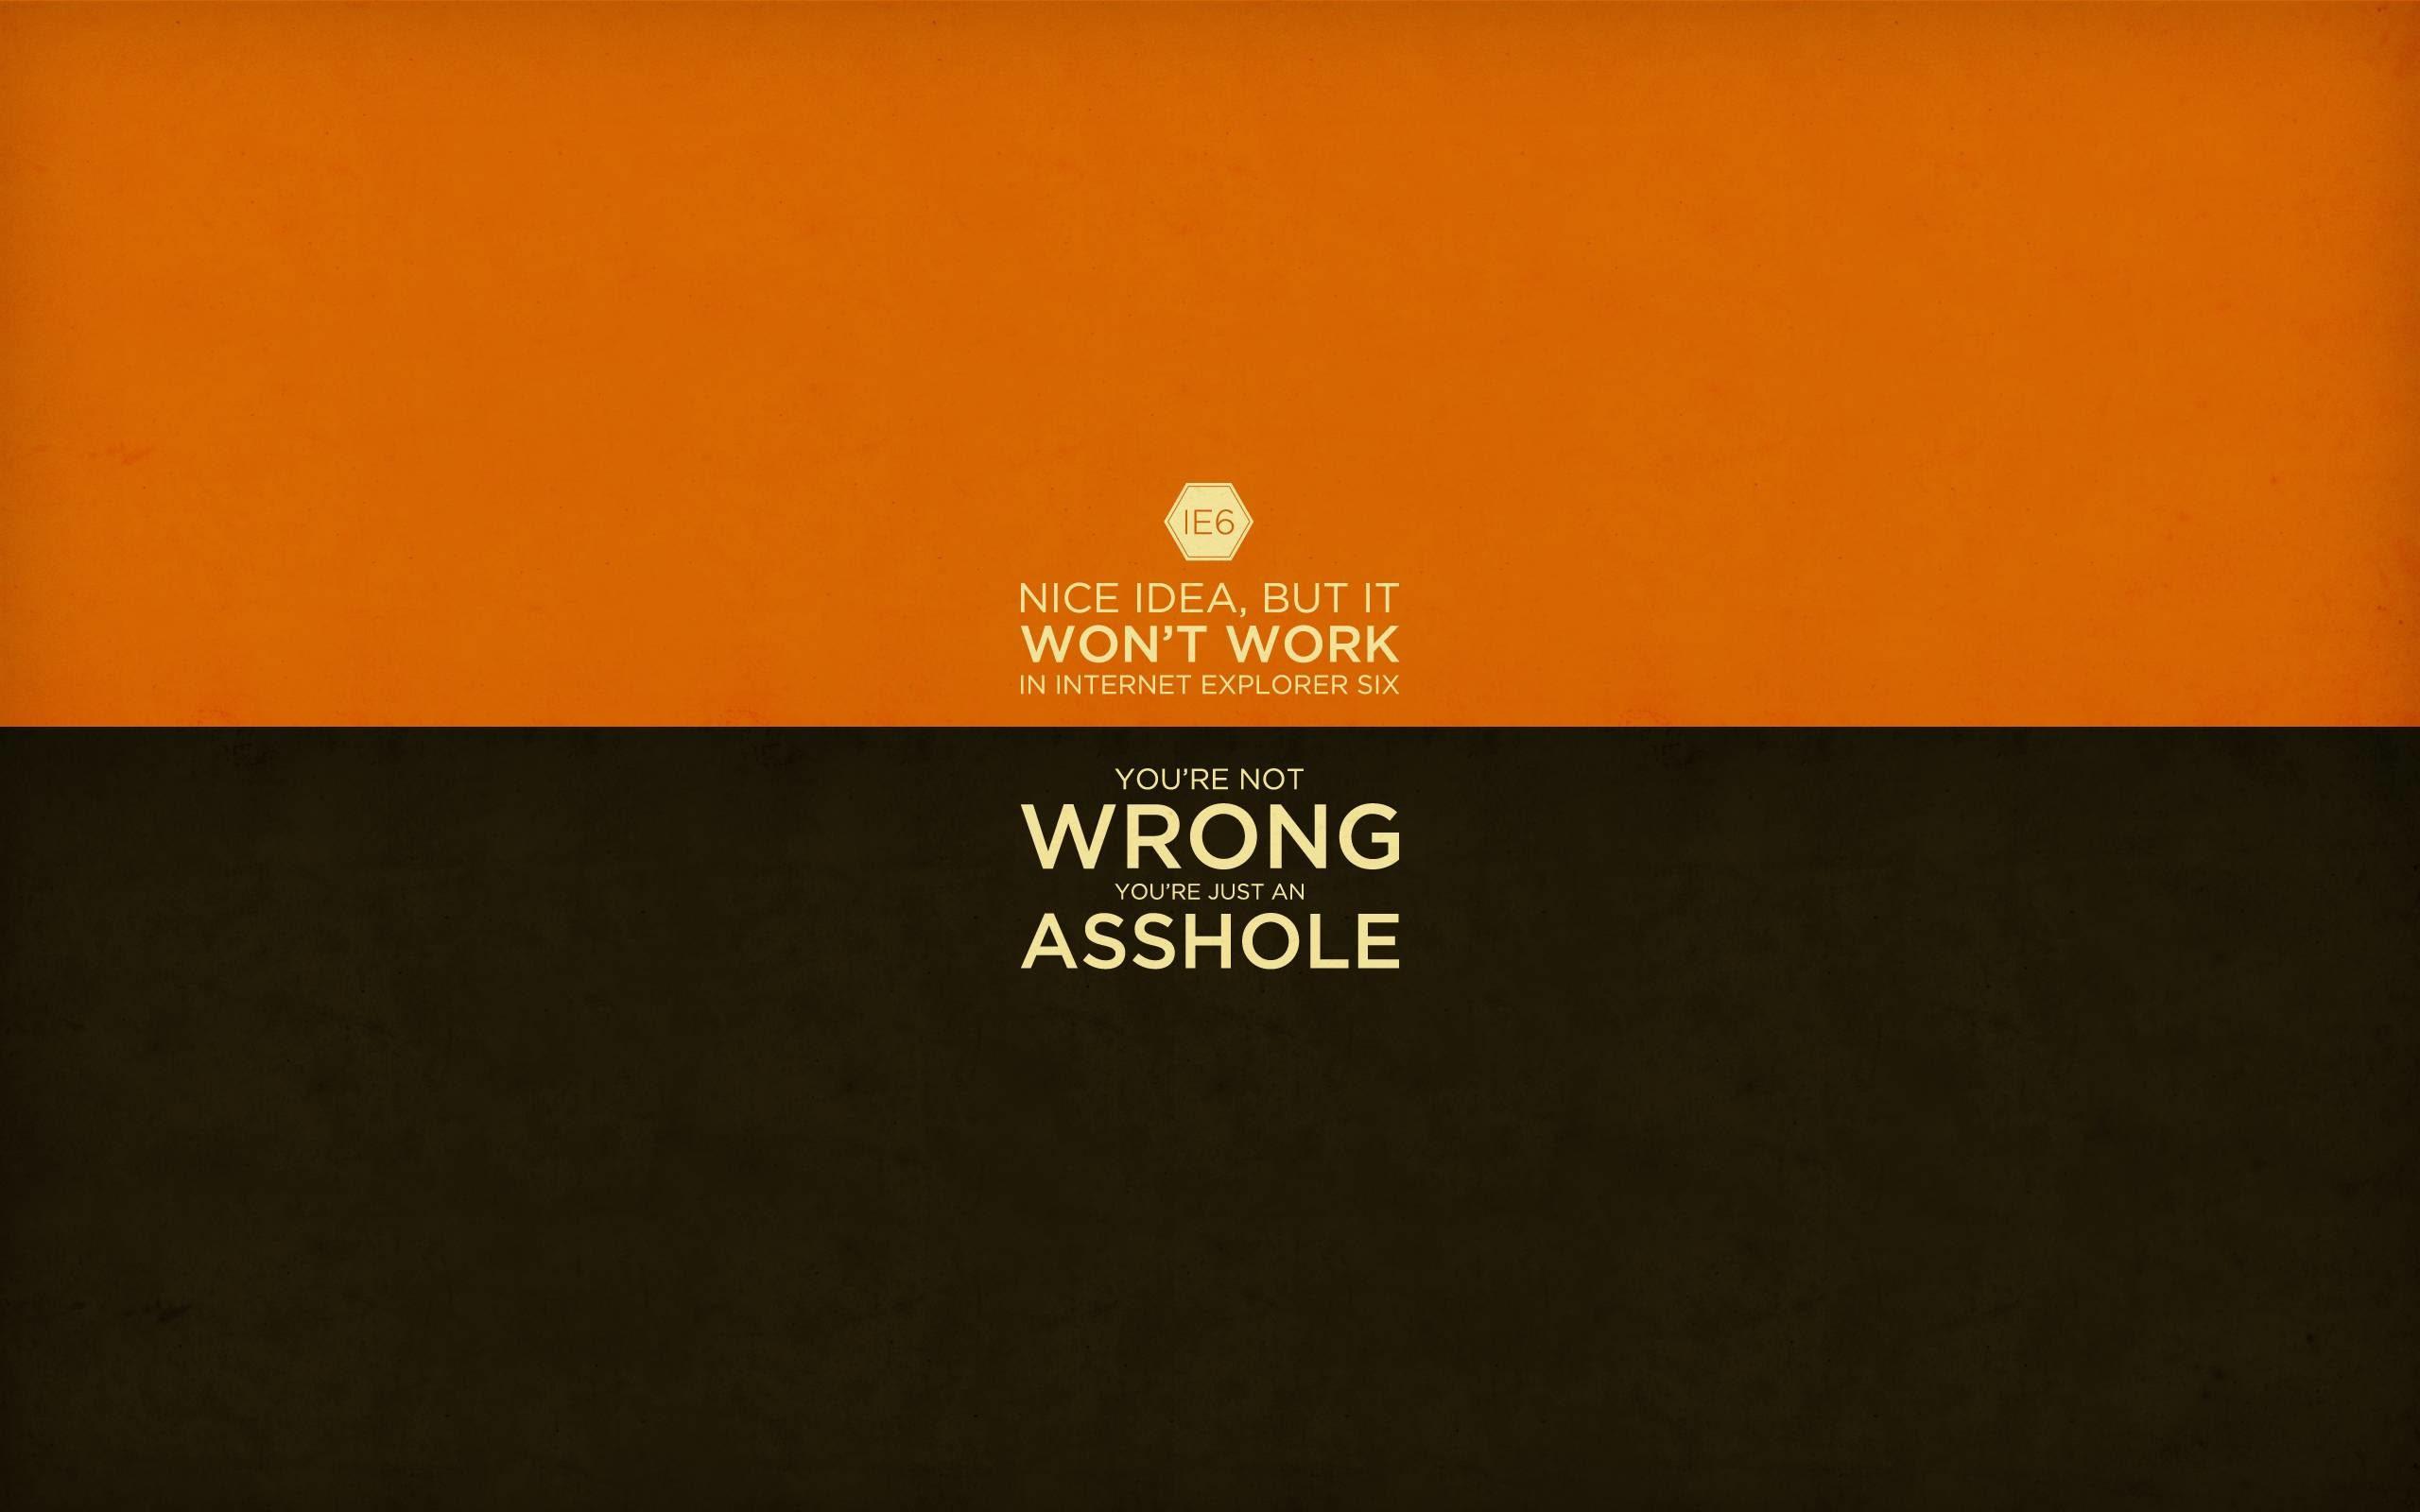 Funny Office Desktop Wallpaper - Funny PNG